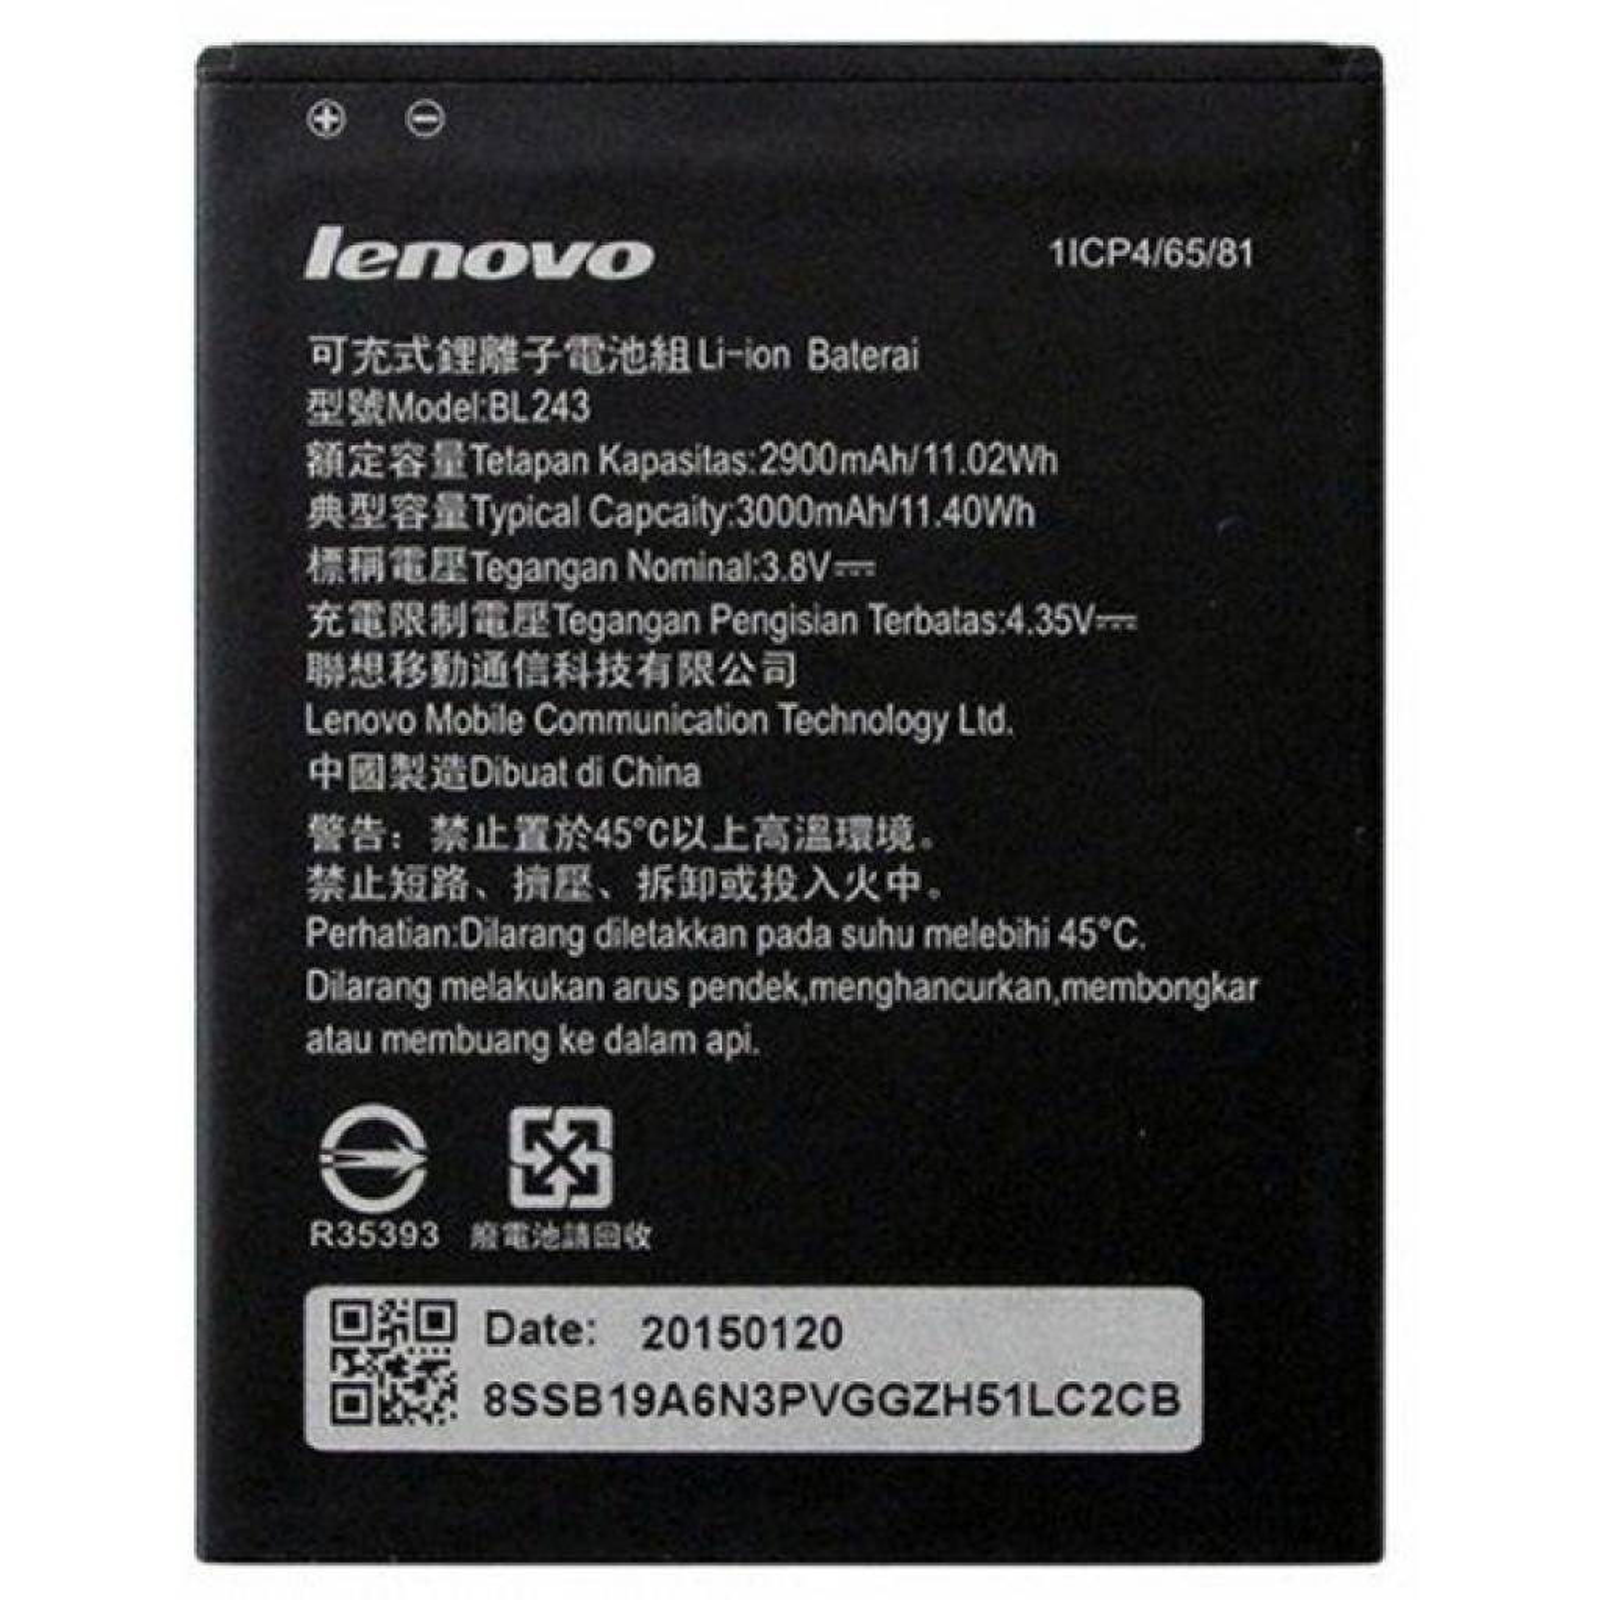 Аккумуляторная батарея Lenovo for A7000/K3 Note/K50 (BL-243 / 39230)